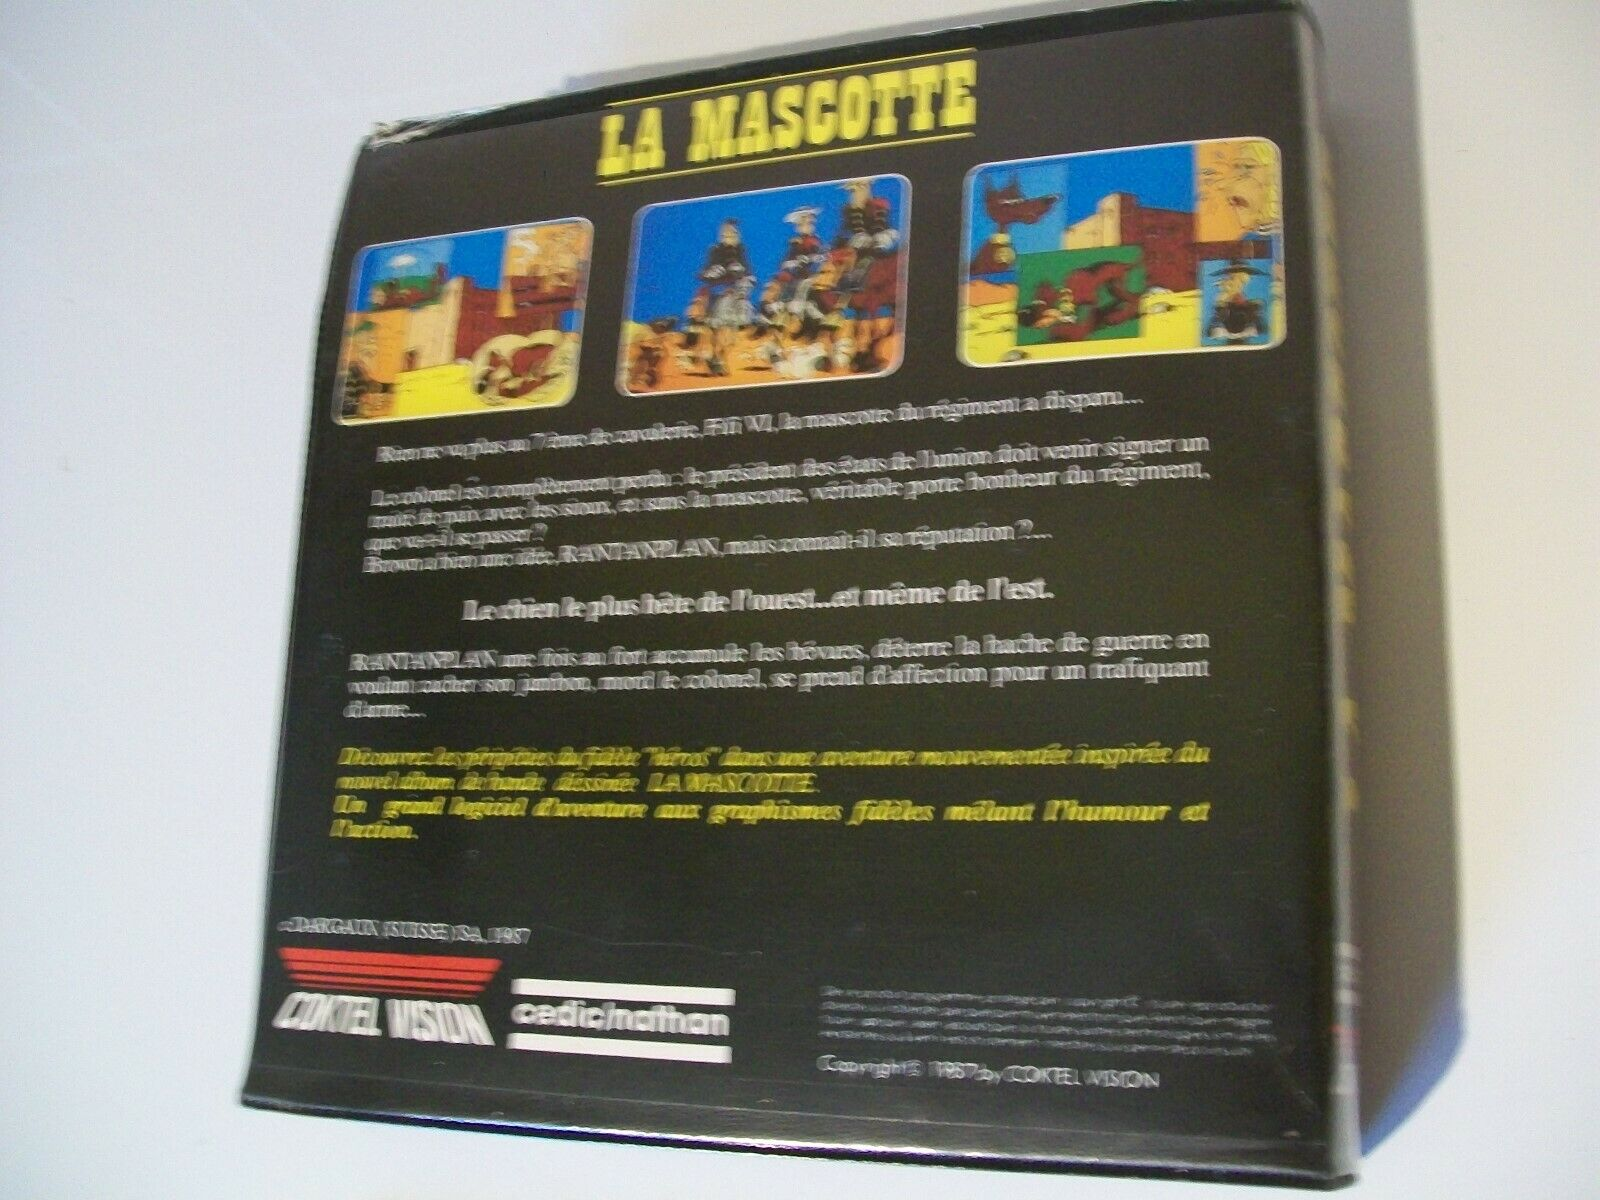 atari-st-la-mascotte-cocktel-vision-03